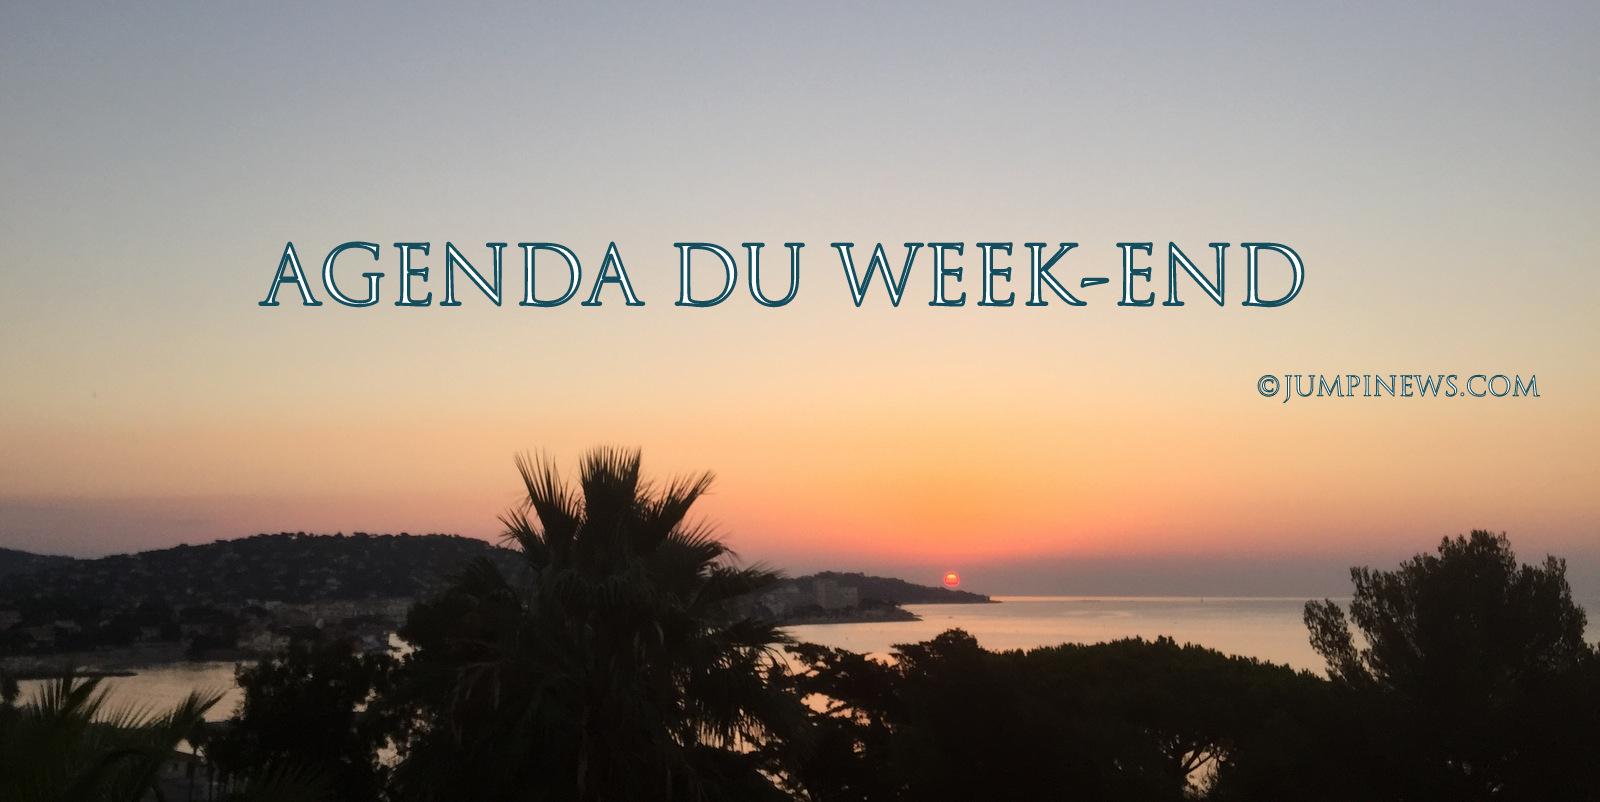 Agenda du week-end ©photo by jumpinews.com:cg